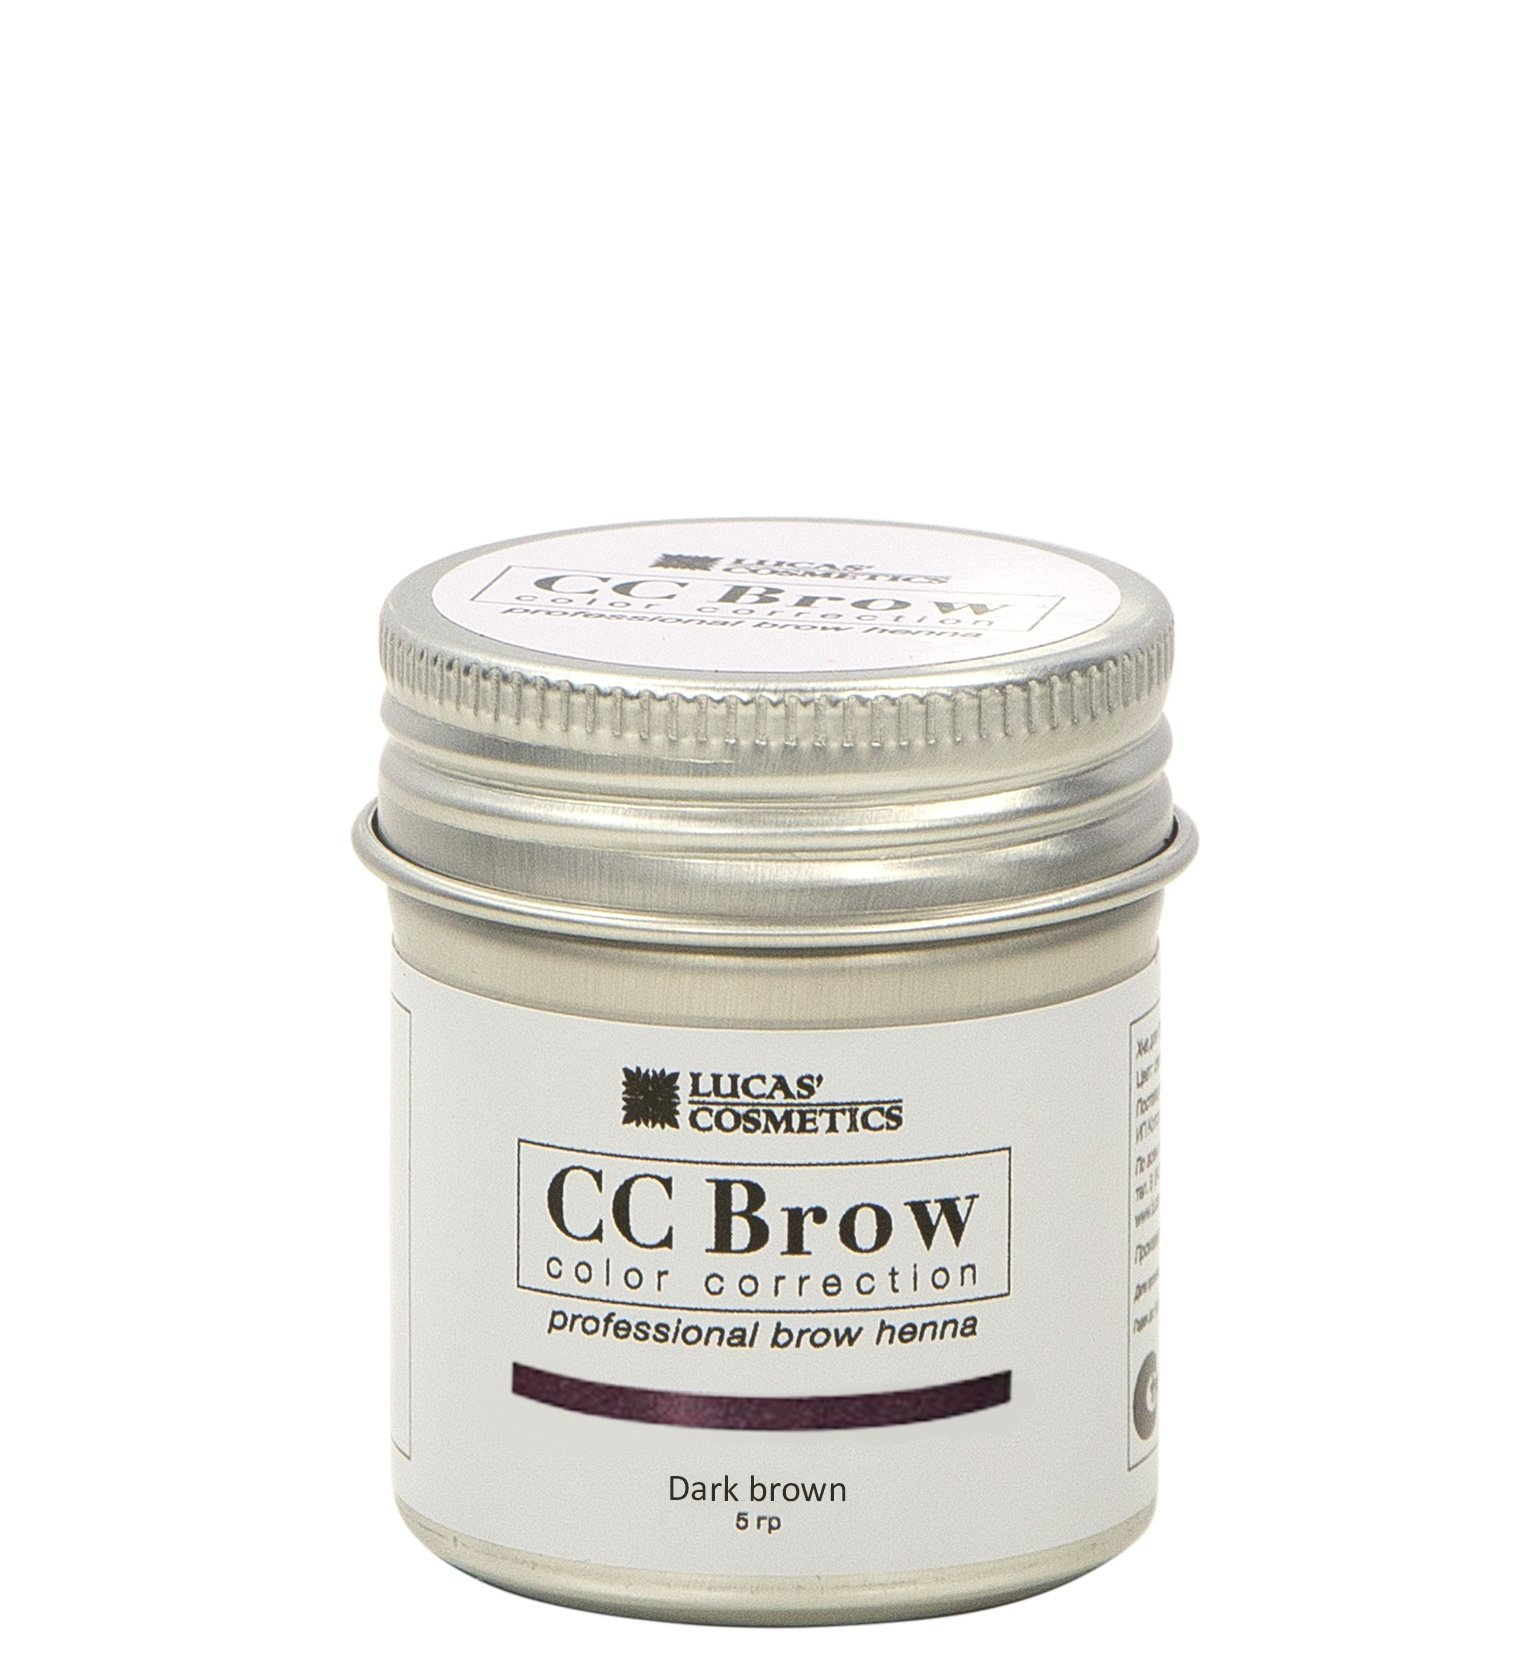 Хна для бровей CC Brow 10гр в баночке Dark Brown Темно-коричневый